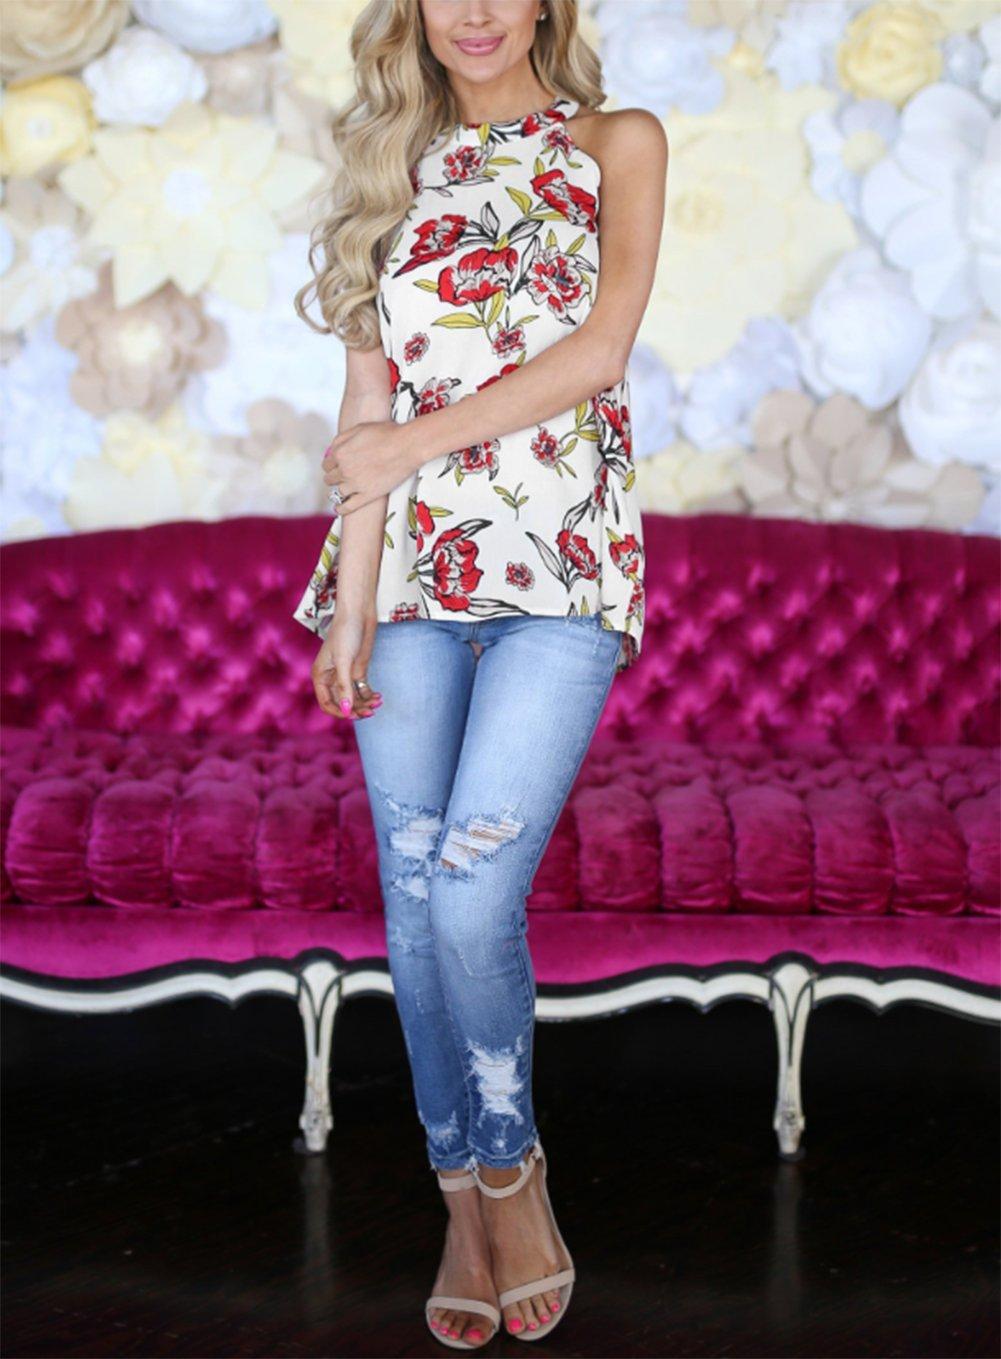 Comcrib Womens Casual Floral Printed Sleeveless Vest Shirt, Ladies Tank Top Blouse Tunic Tops Summer Beachwear T-Shirt by Comcrib (Image #6)